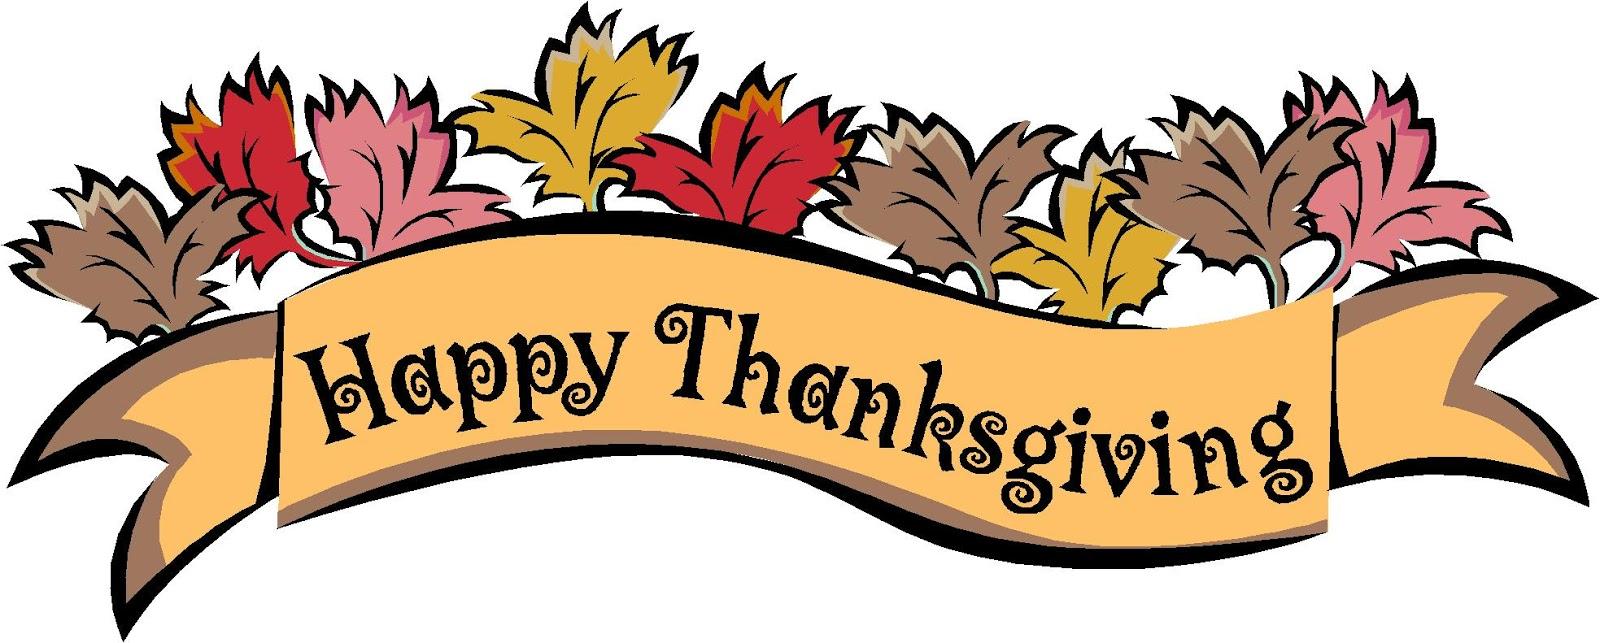 1600x643 Religious Thanksgiving Clip Art Clipart